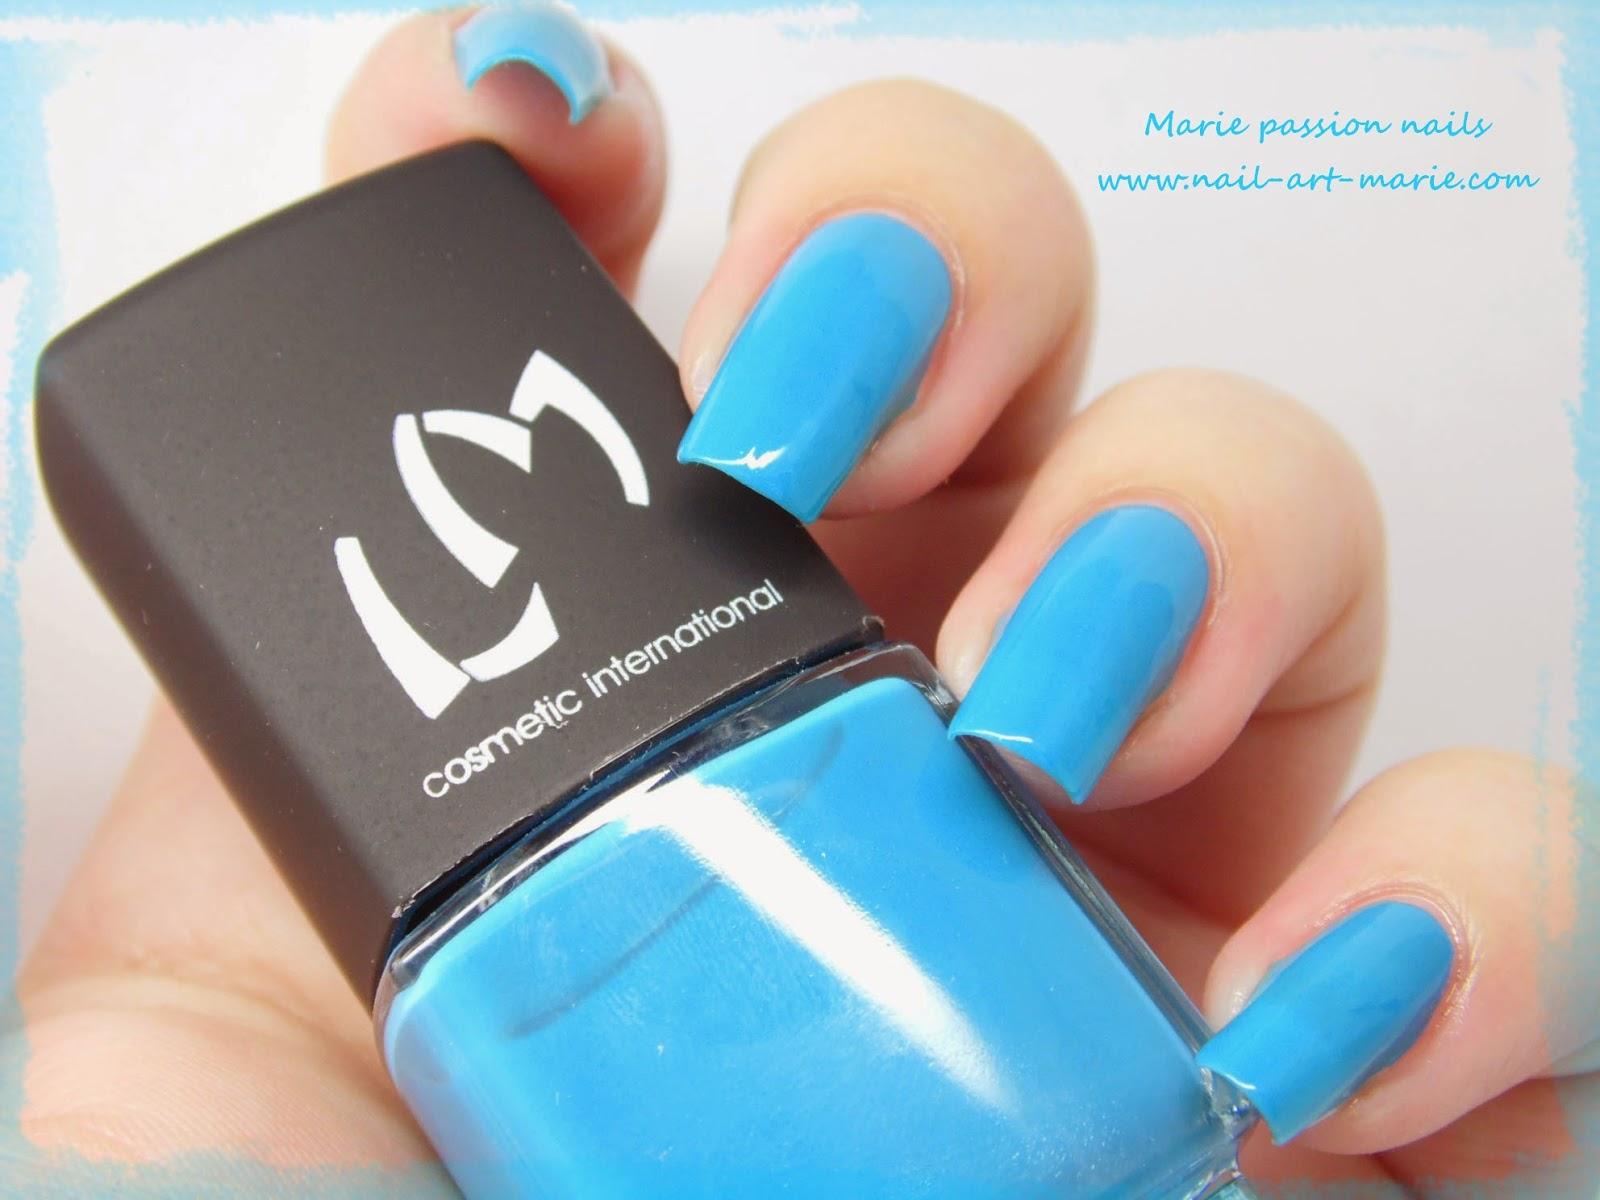 LM Cosmetic Pantanal6